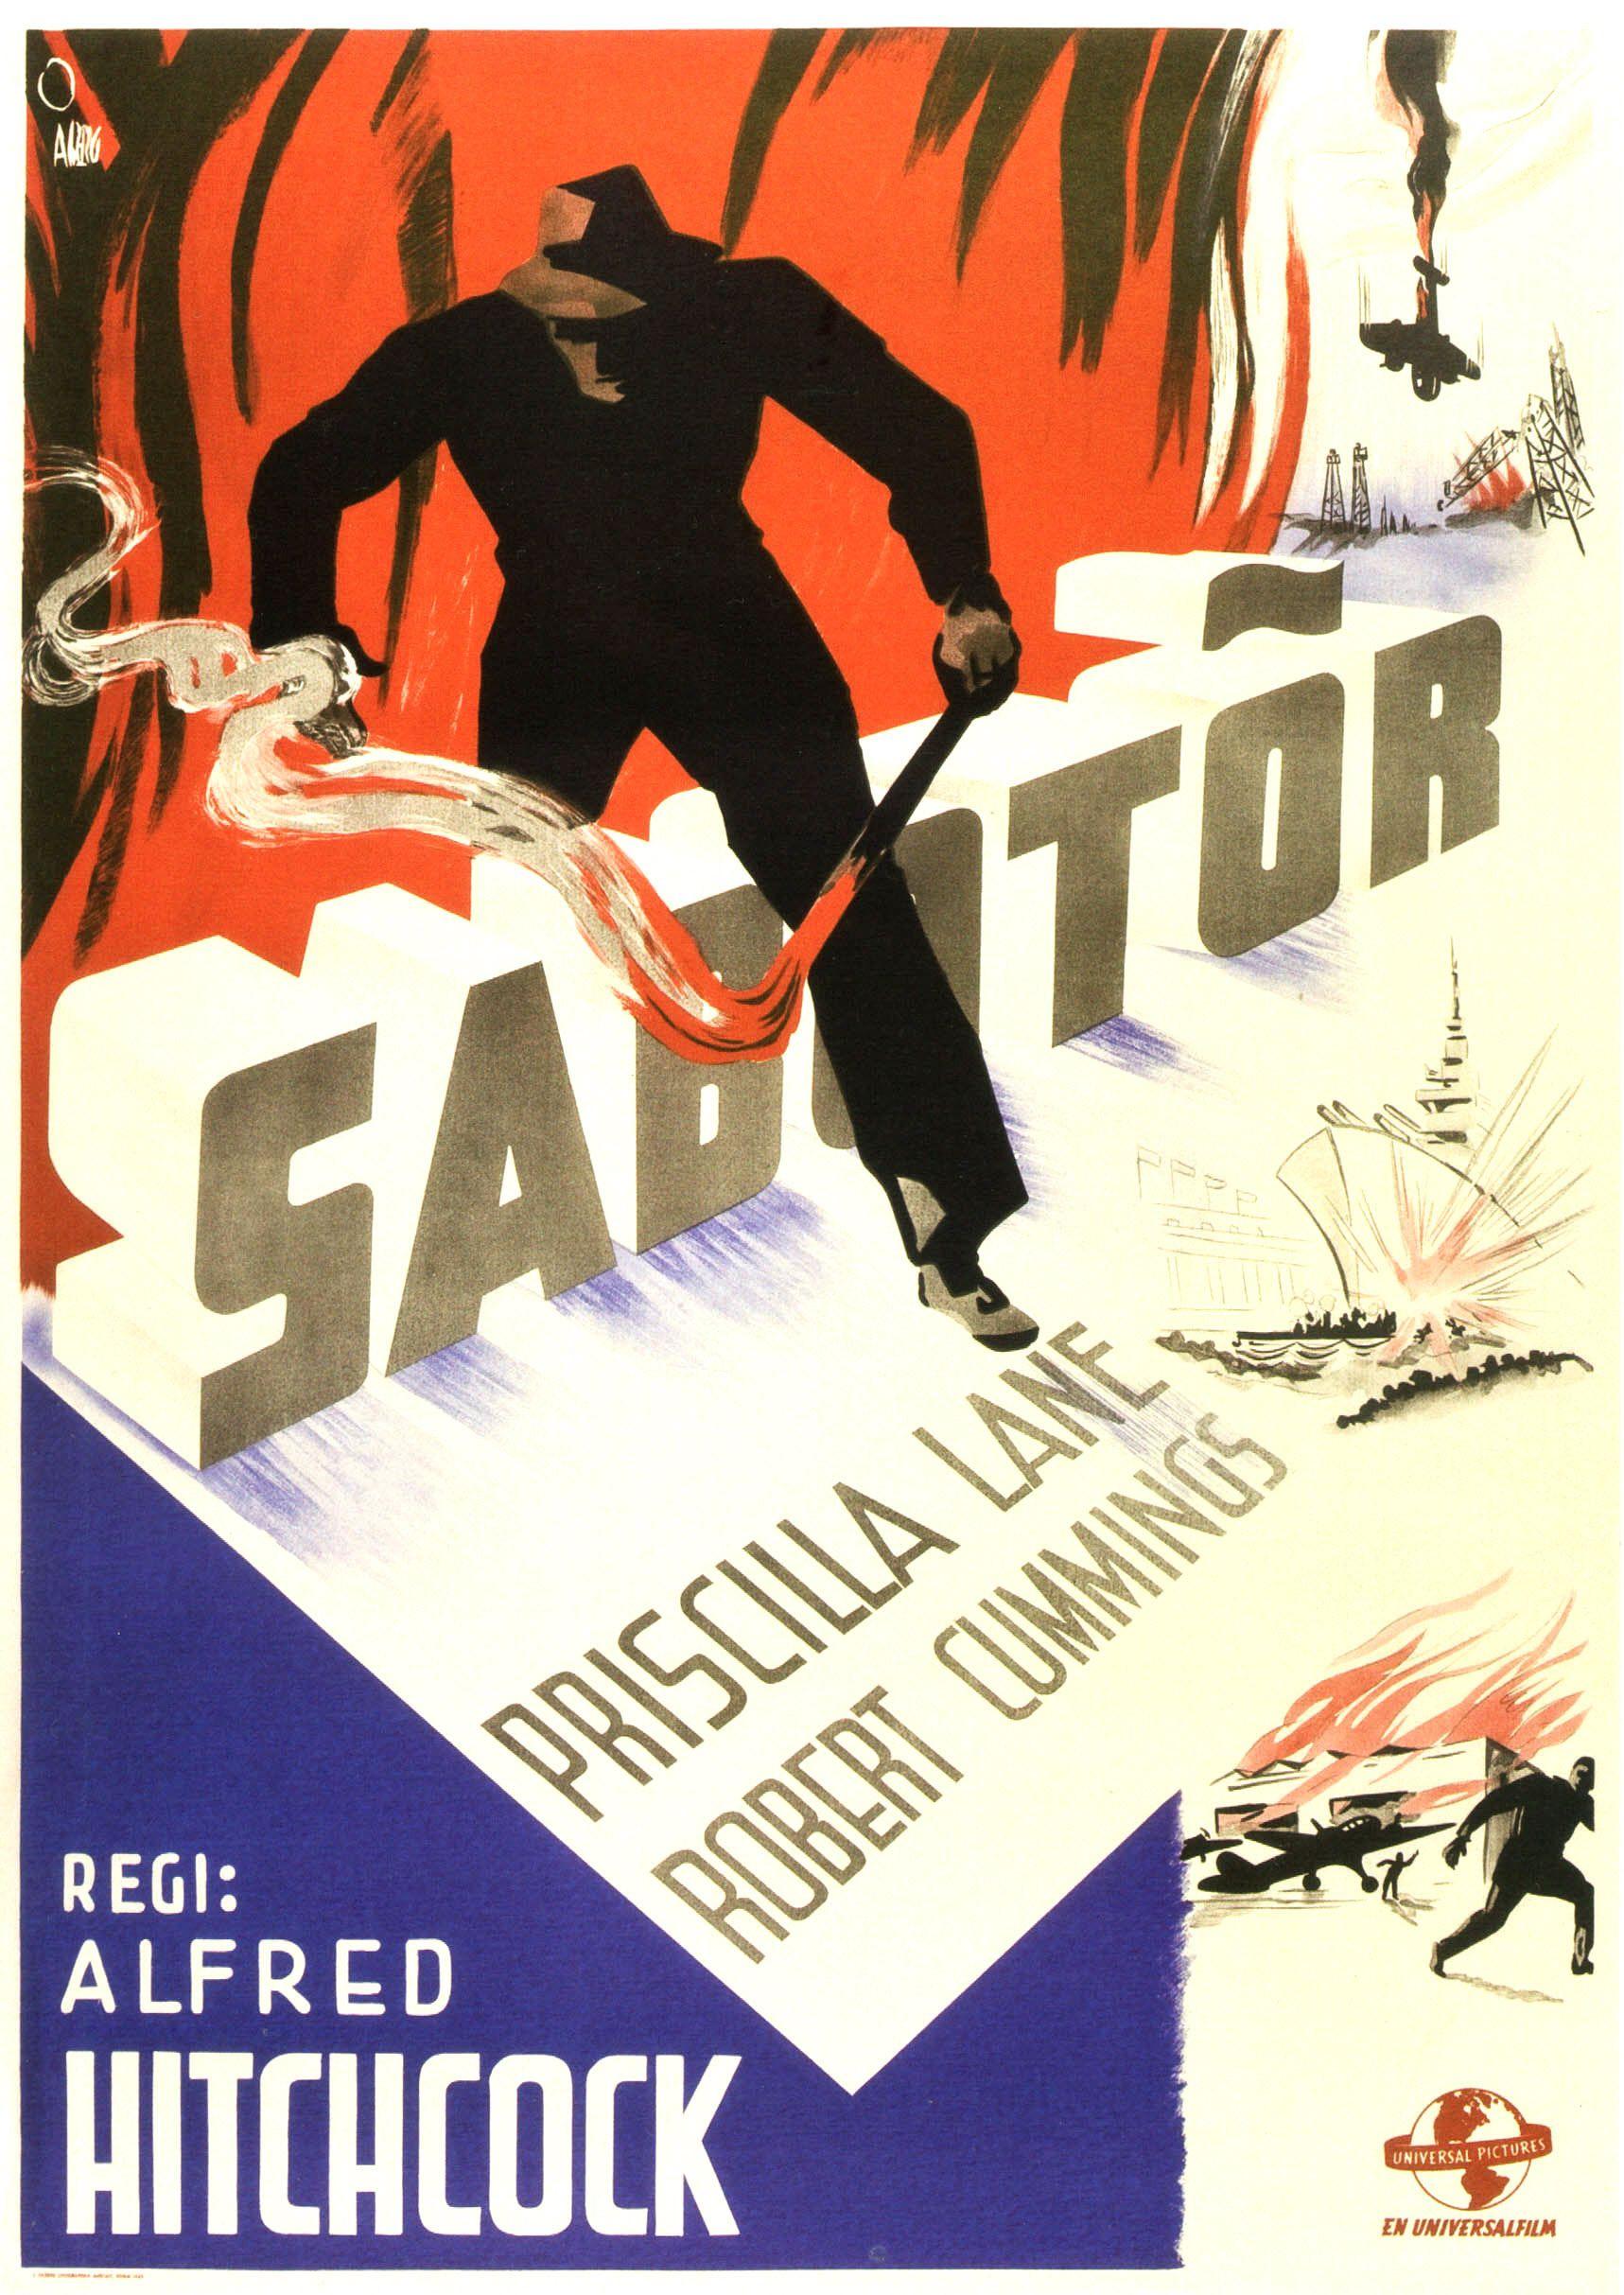 Alfred Hitchcock (1942) Saboteur - M169 - #Movie #Film #Movie Poster